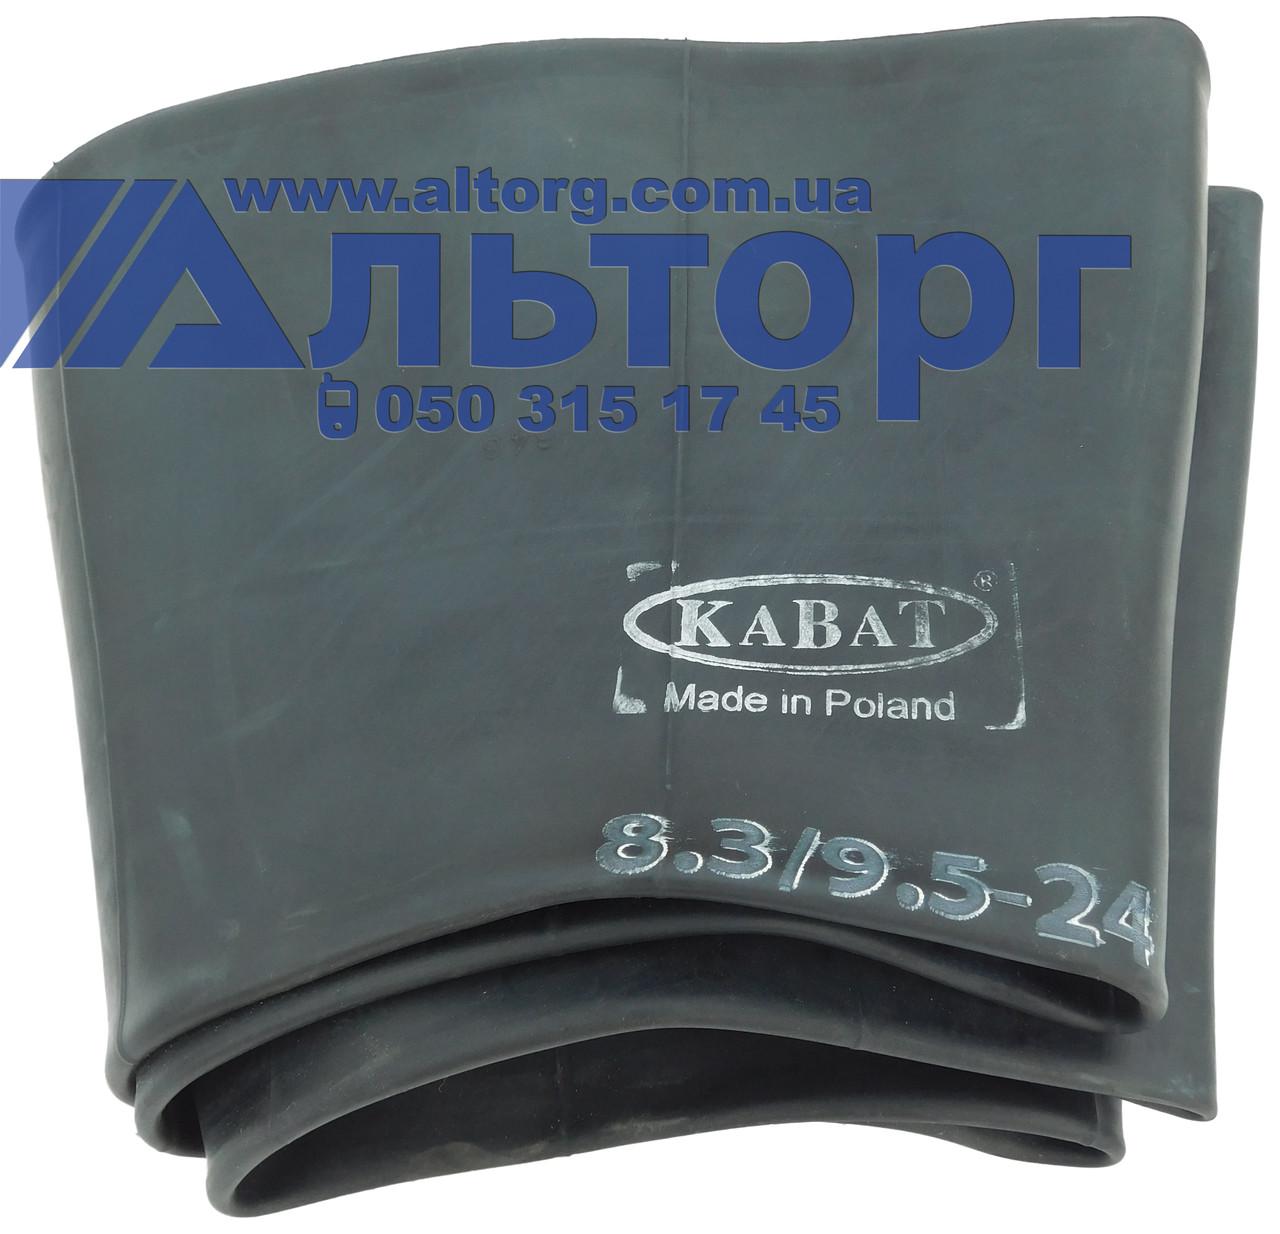 Камера 8.3/9.5-24 TR-218A - Kabat